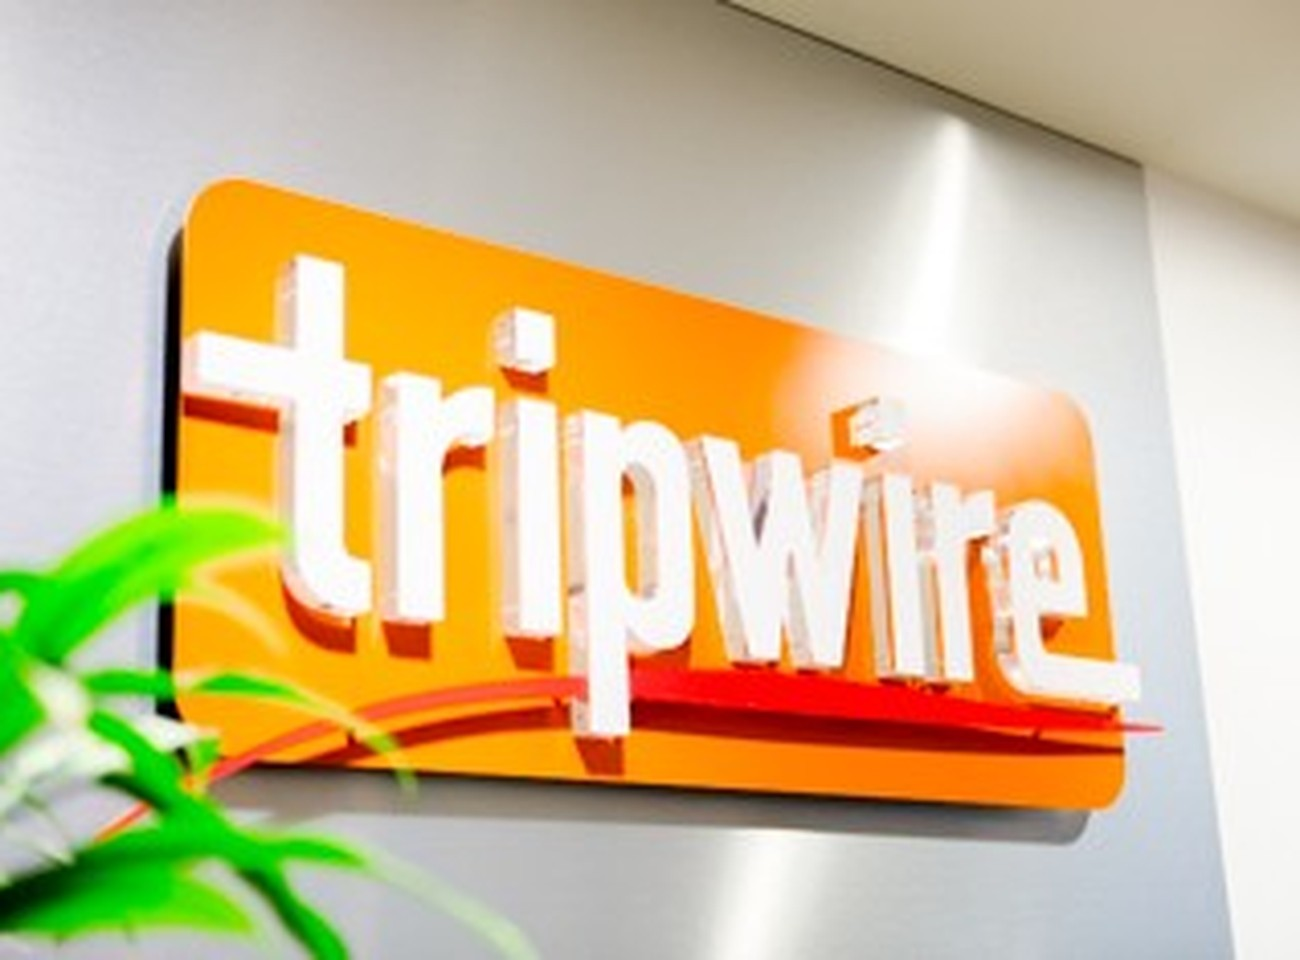 Tripwire Careers